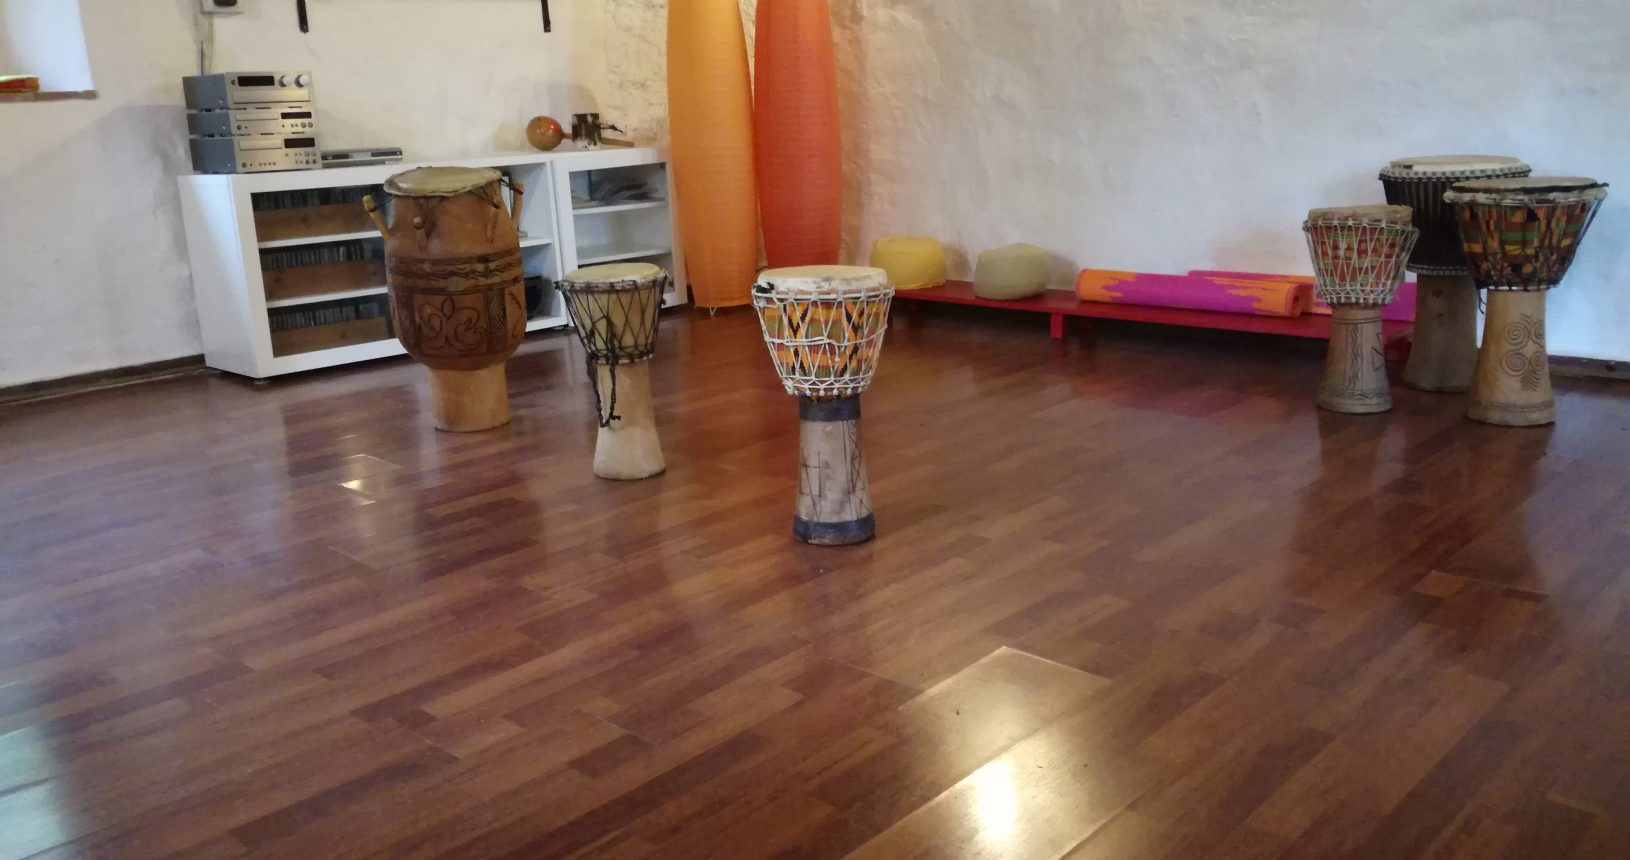 seminarroom with drums